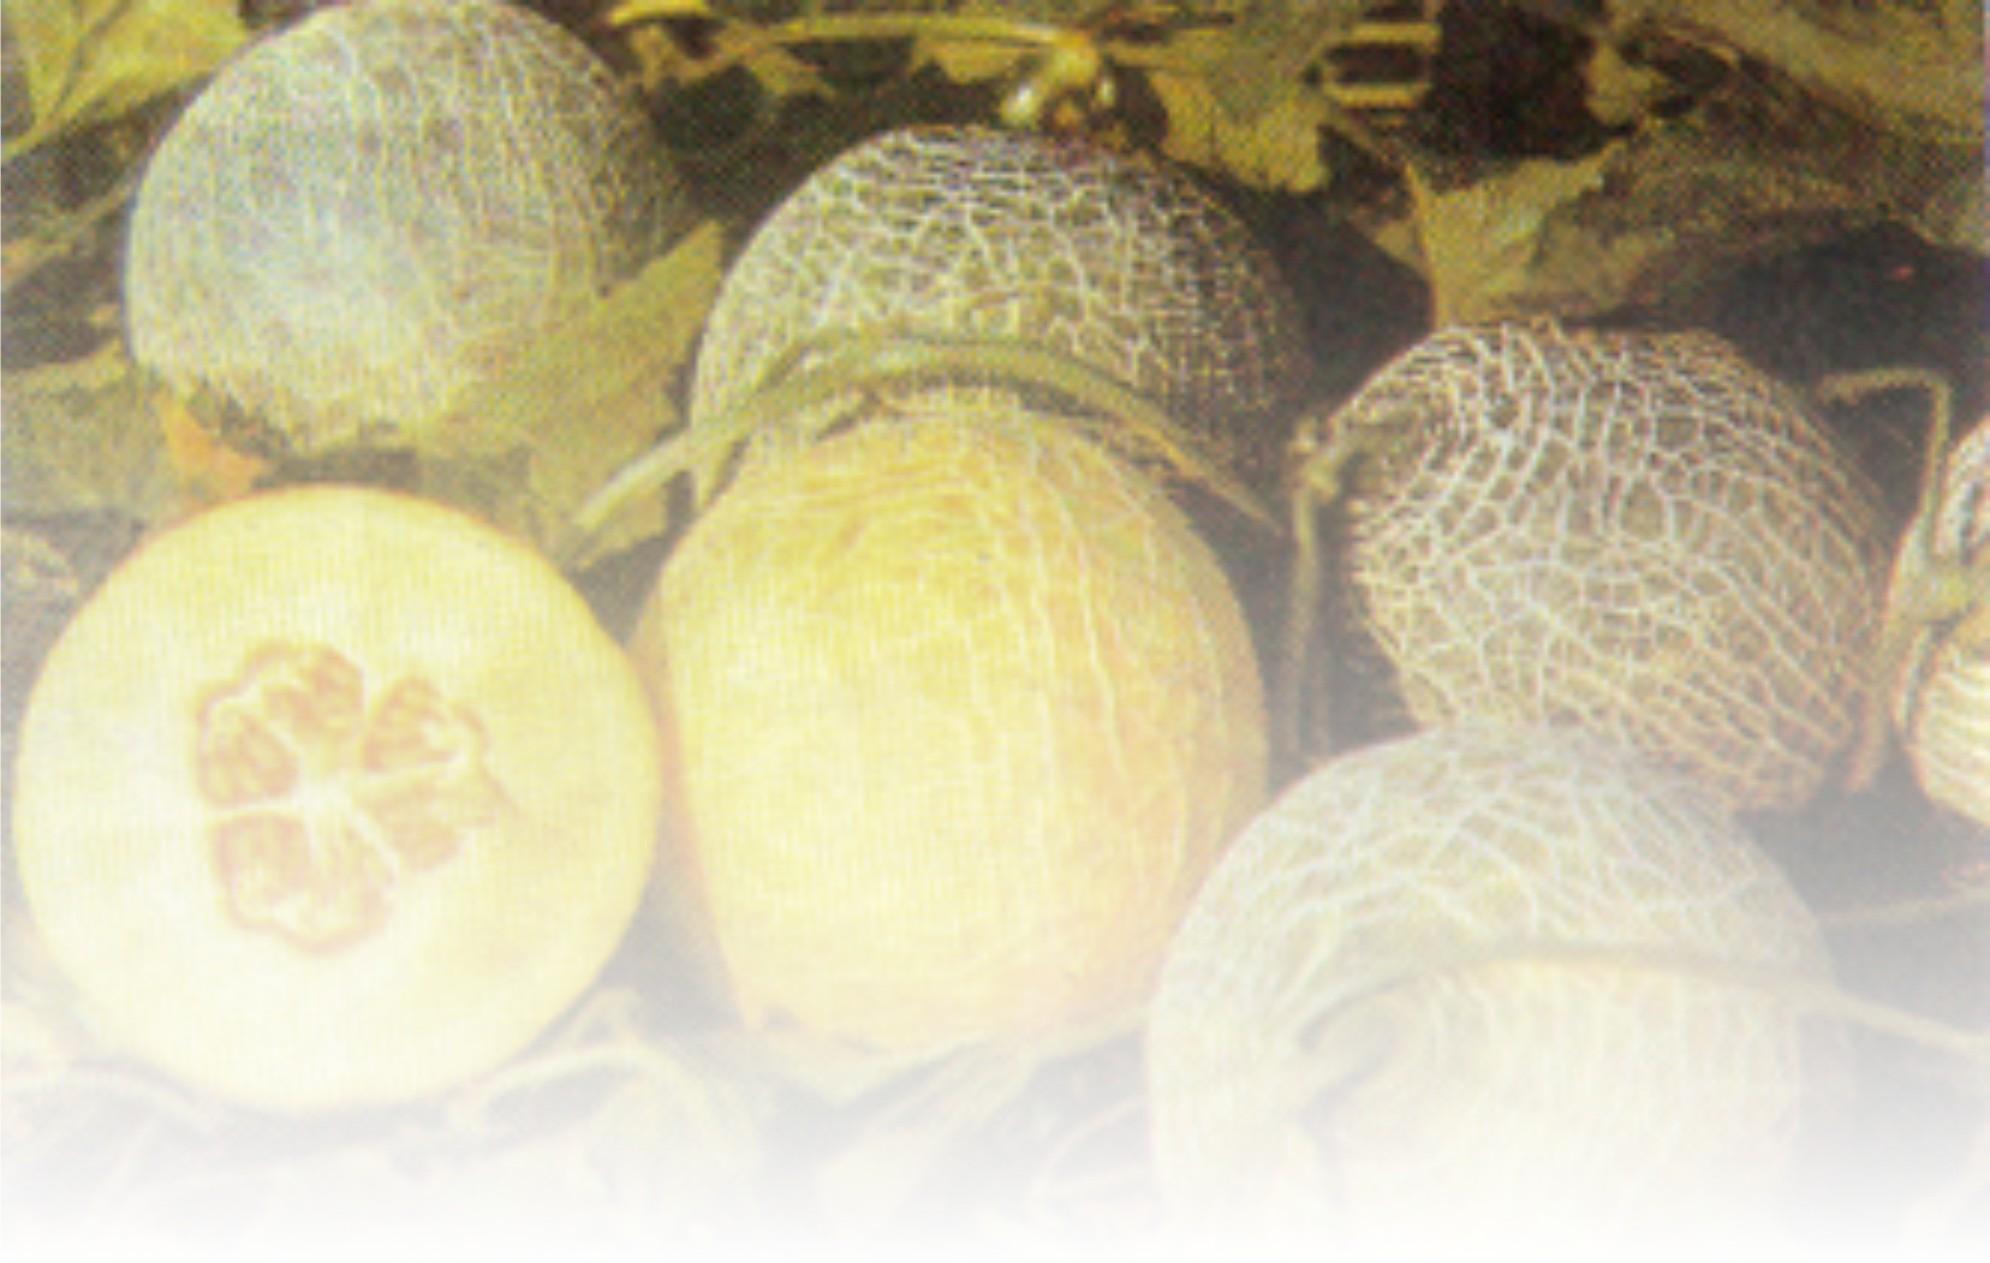 Artikel Tentang Agribisnis Agrobisnisinfocom Agribisnis And Herbal Info Artikel Tentang Agribisnis Melon